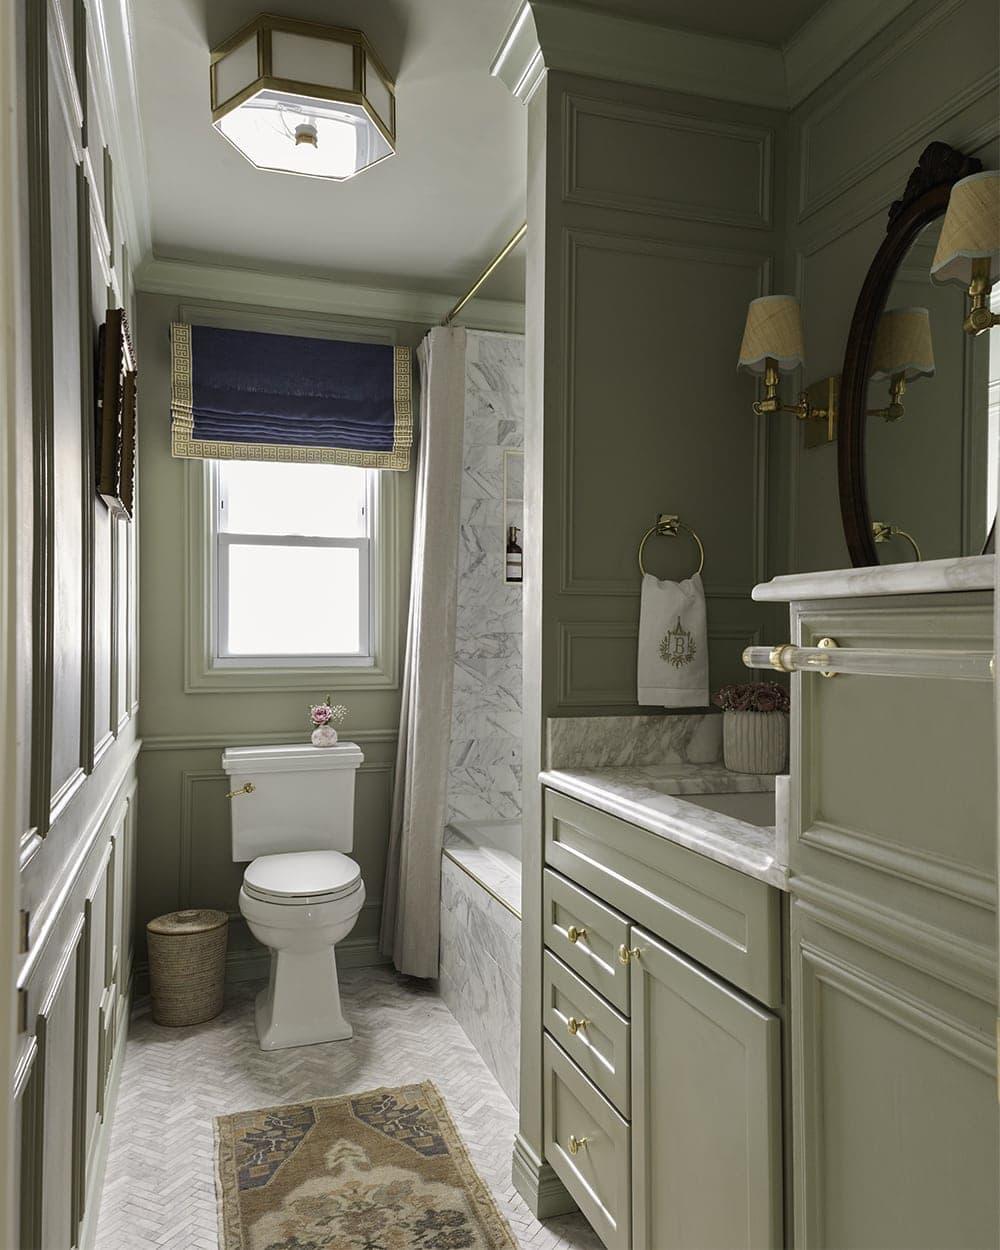 one-room-challenge-modern-traditional-bathroom-reveal-a-glass-of-bovino-alisa-bovino